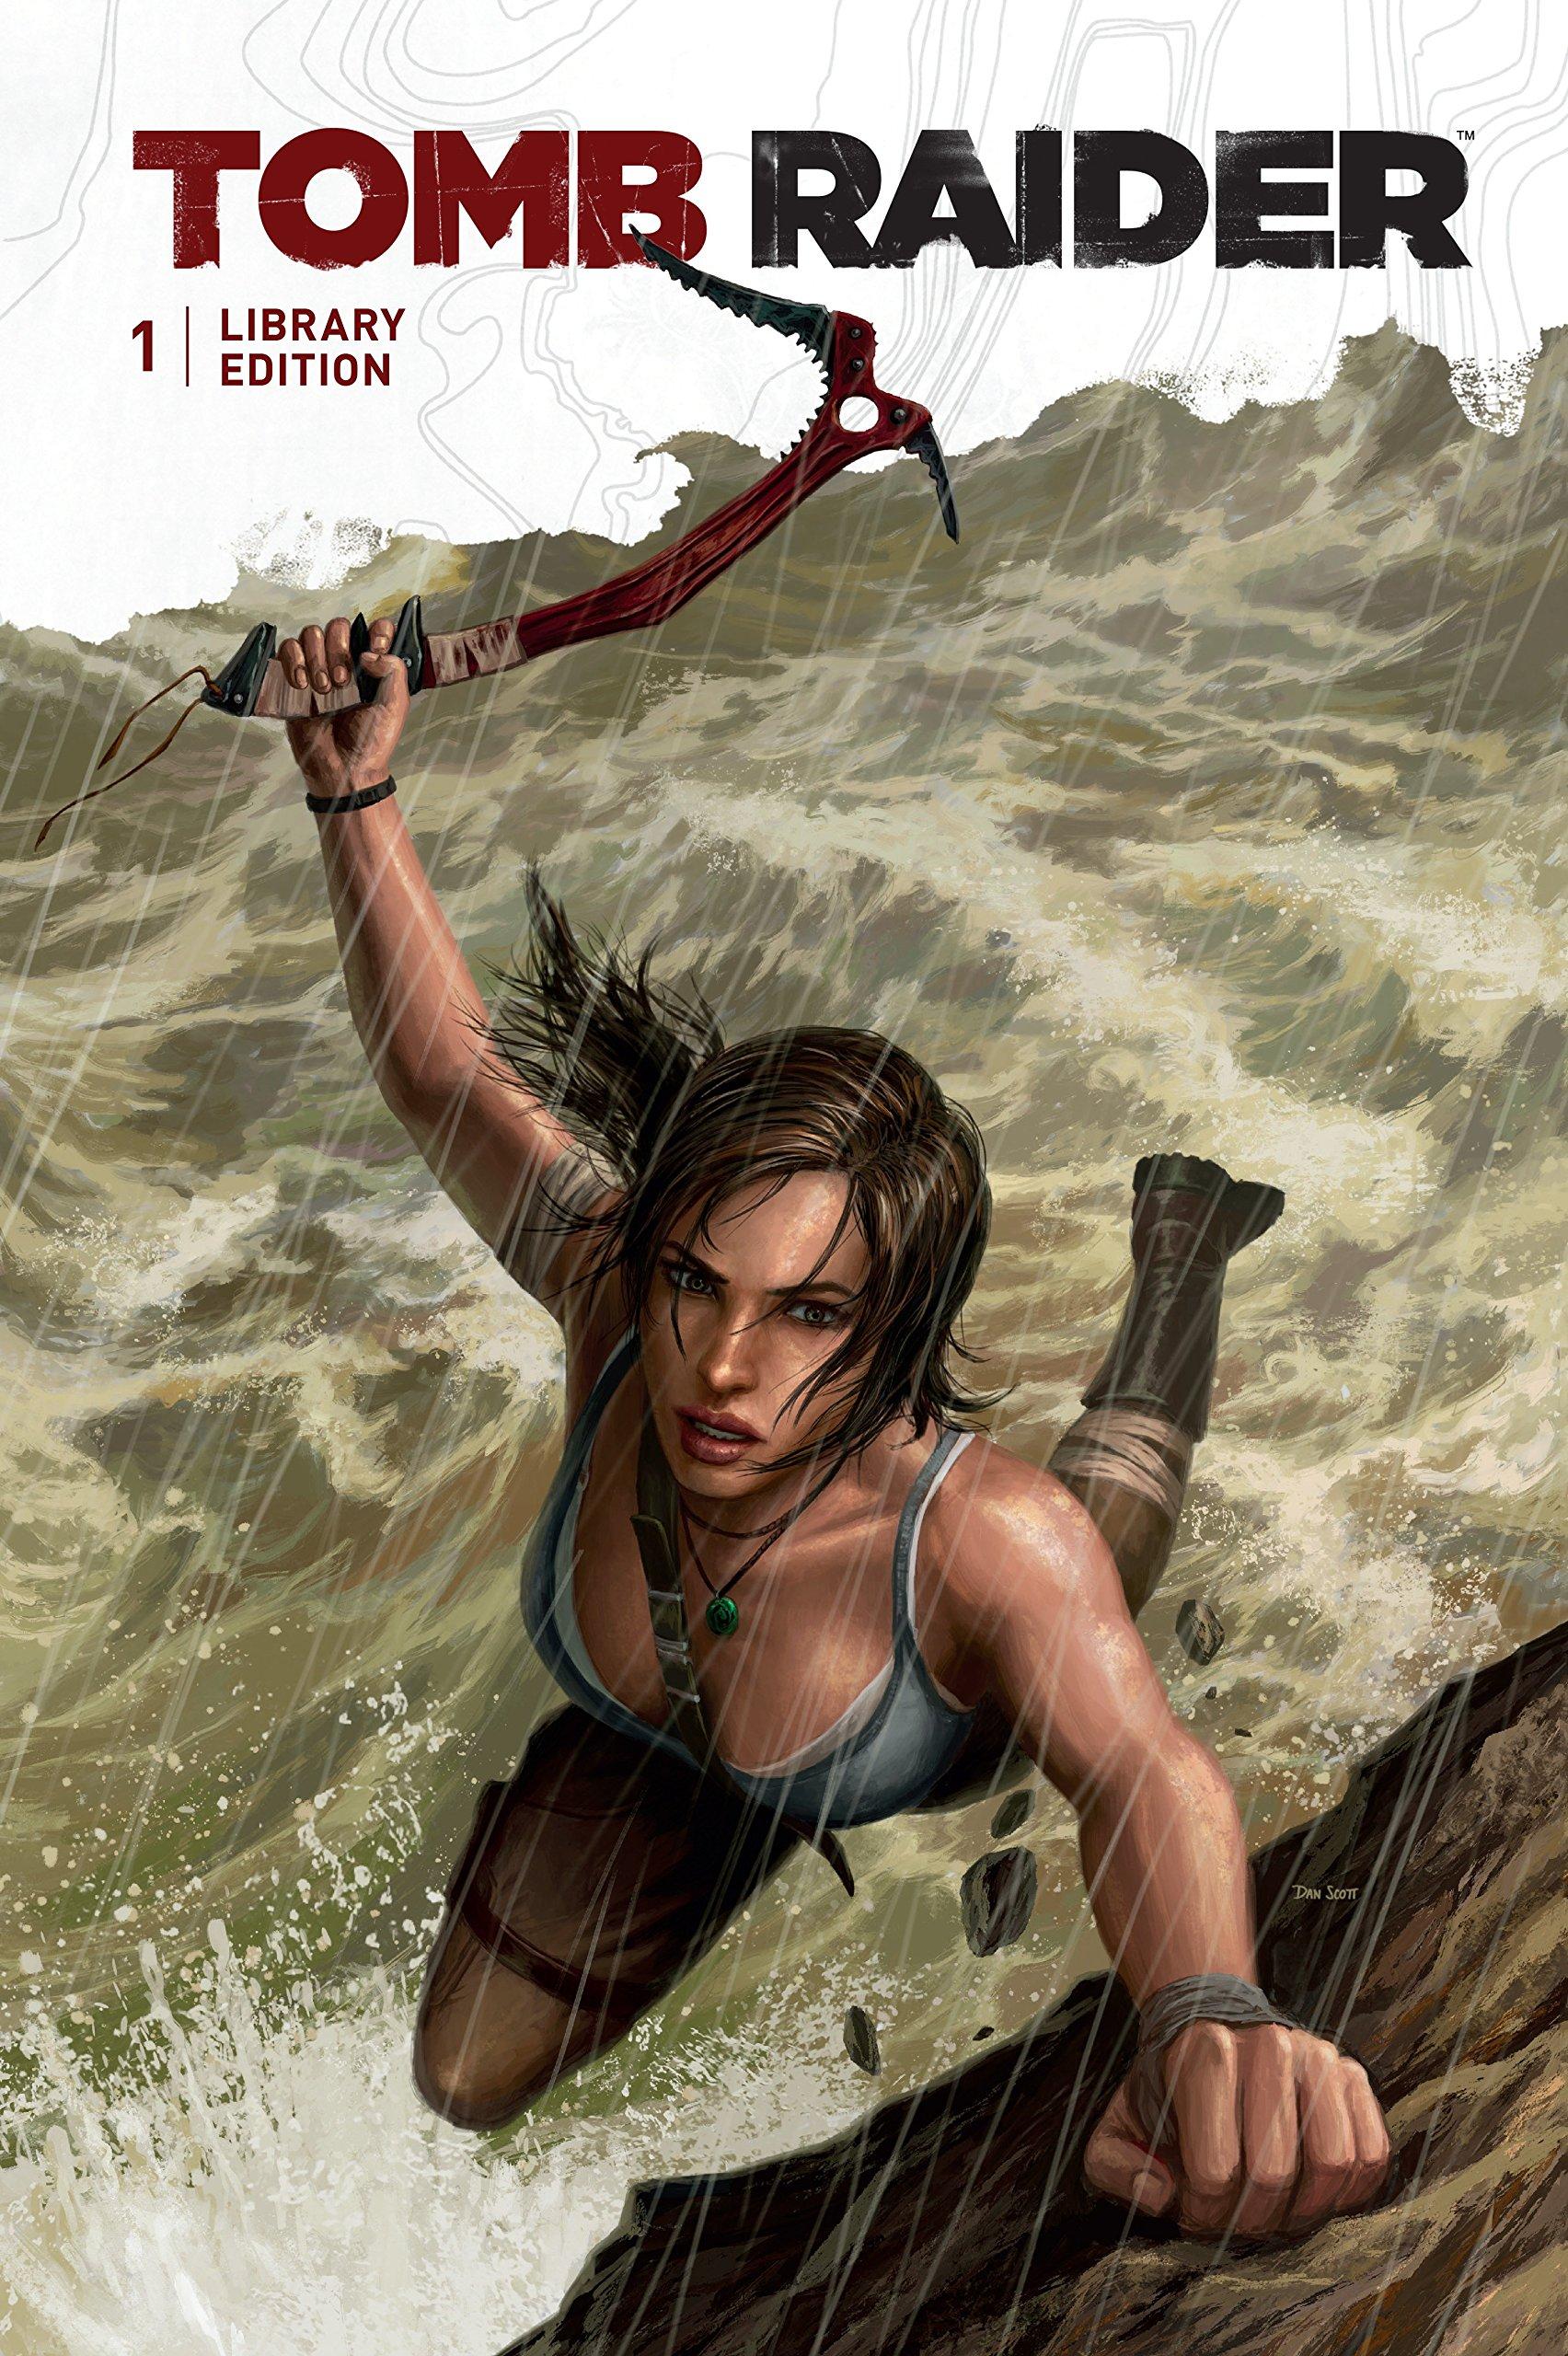 Tomb Raider Library Edition Volume 1: Gail Simone: 9781616559601: Books -  Amazon.ca